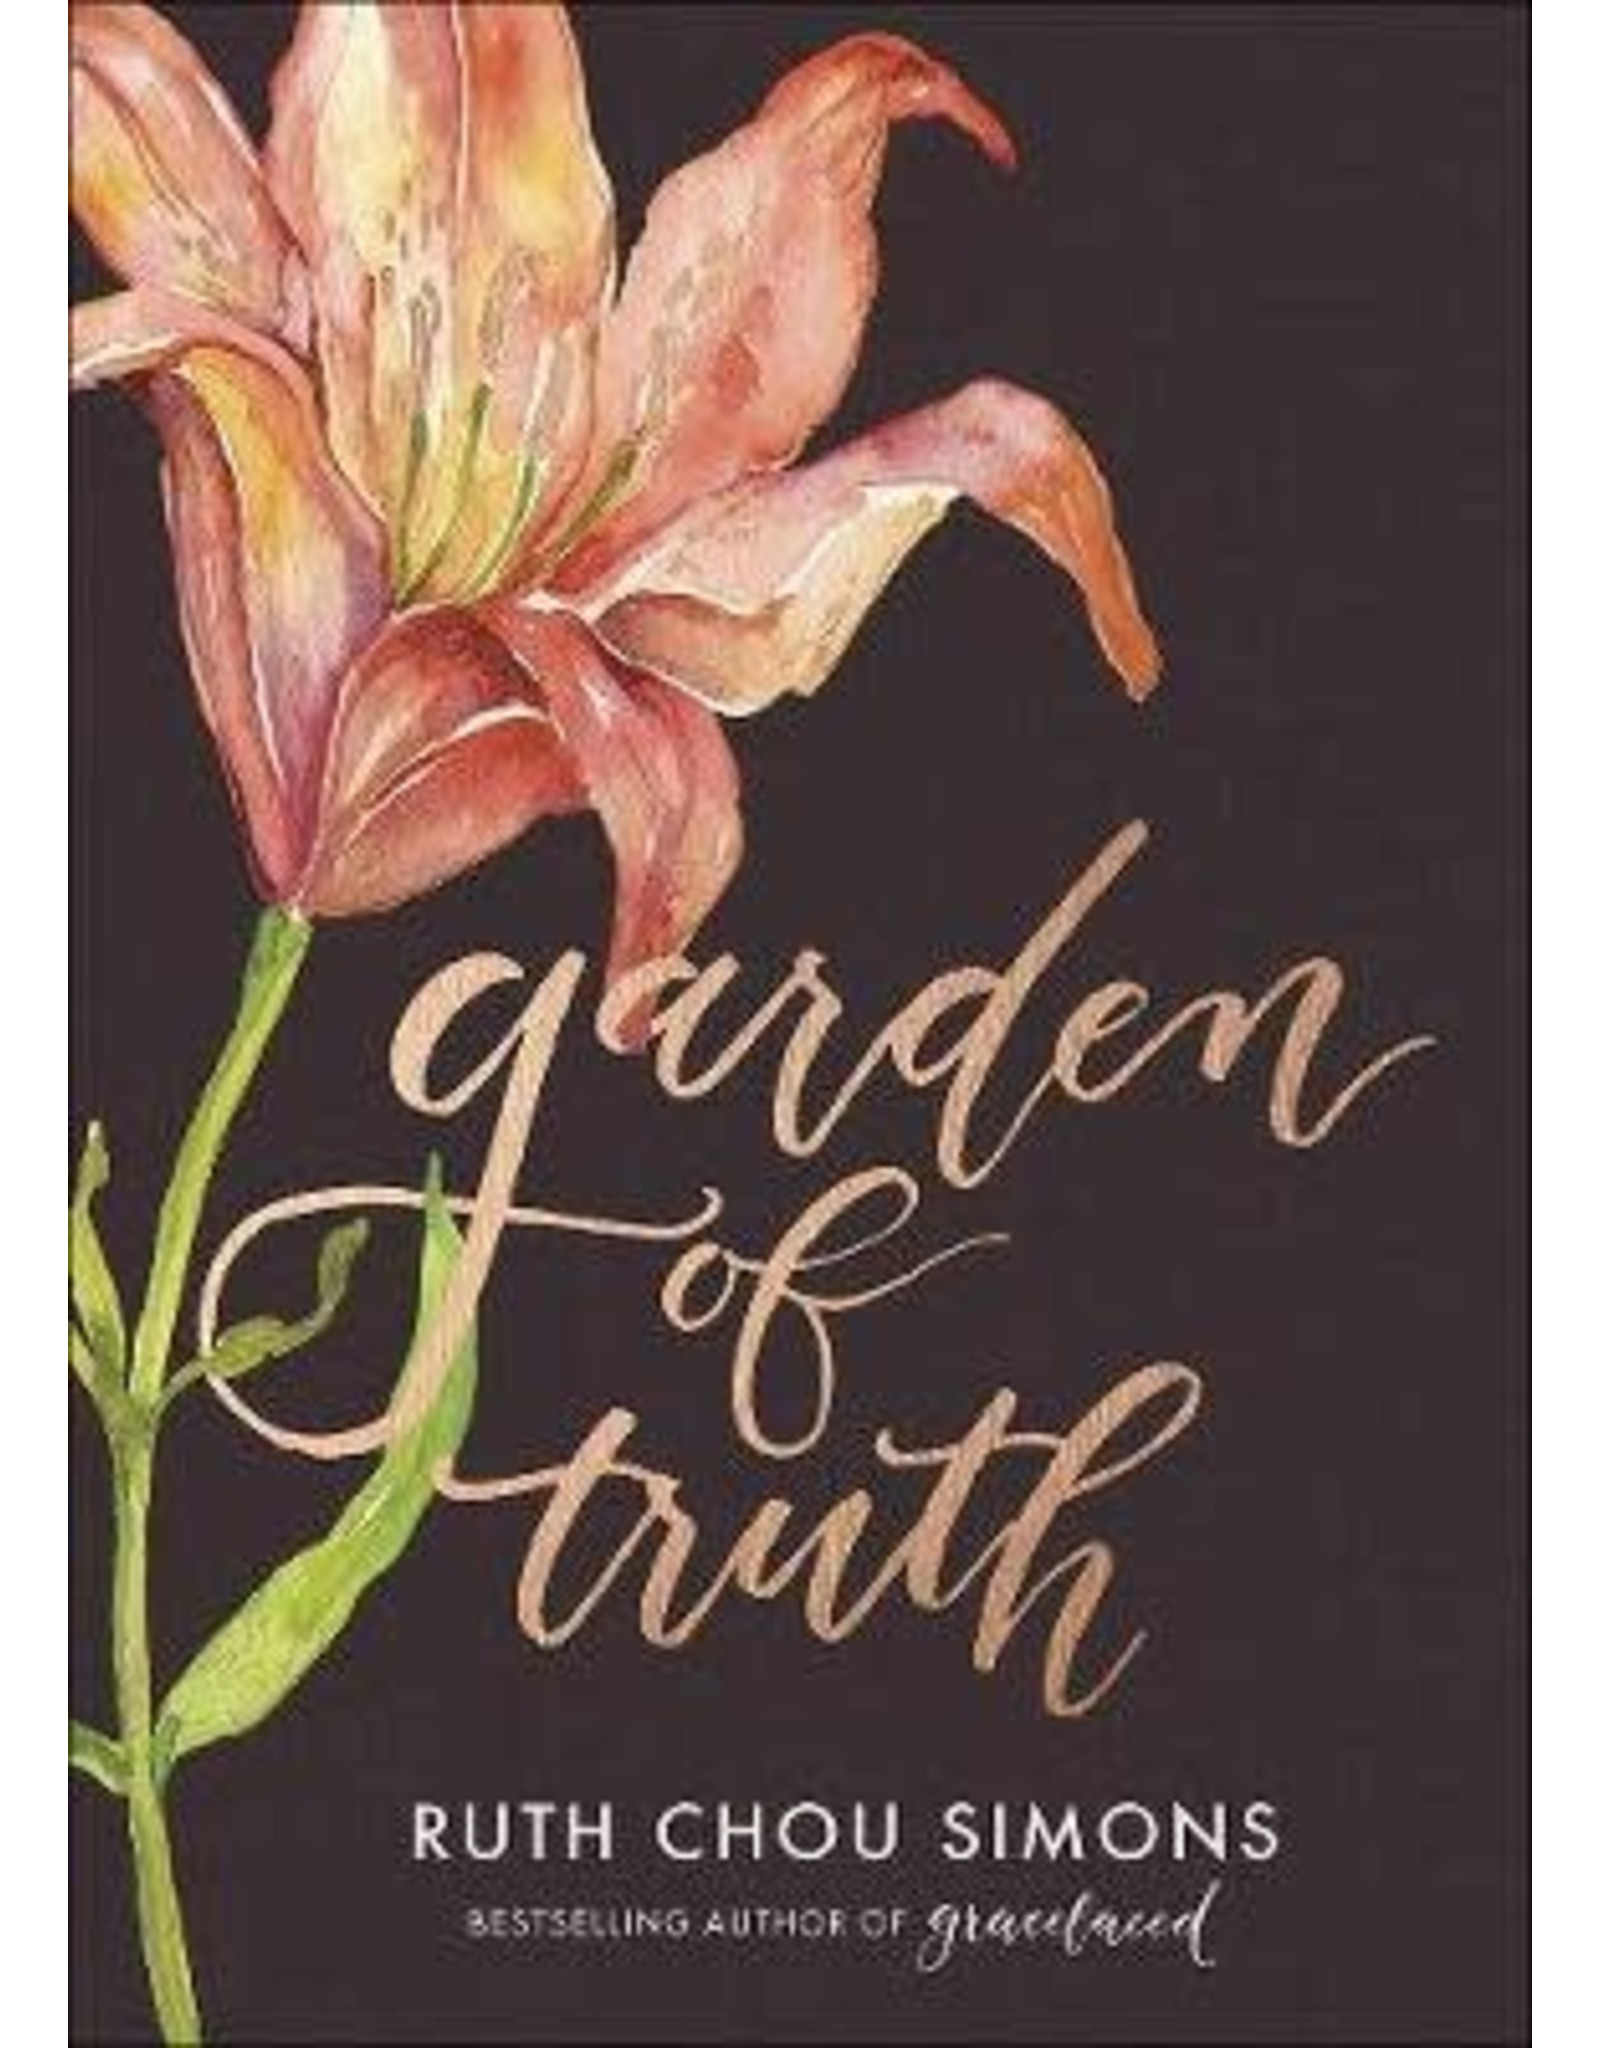 Ruth Chou Simons Garden of Truth